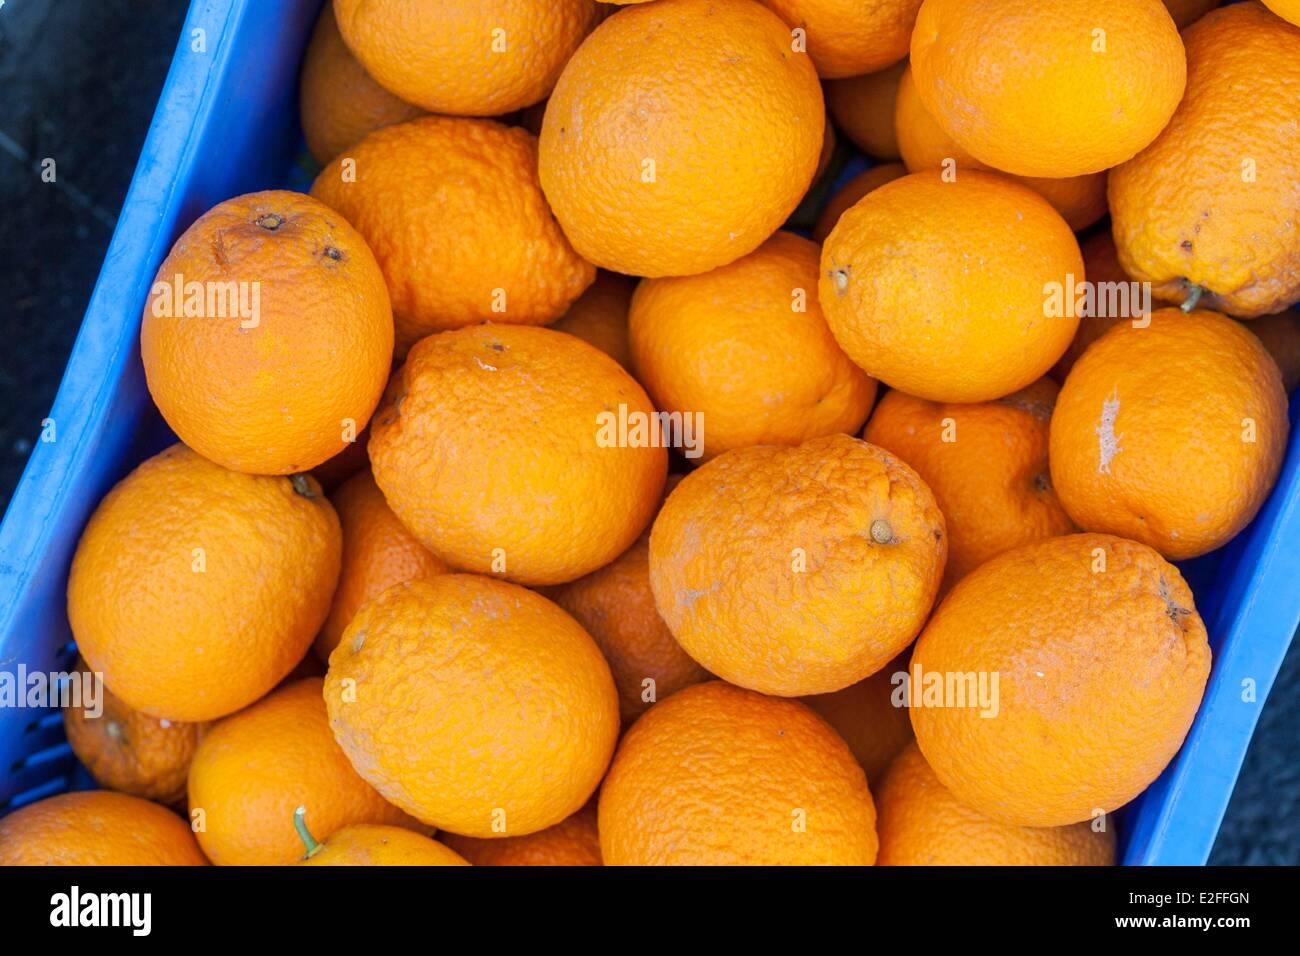 Cyprus, Larnaca, market, oranges in bulk - Stock Image